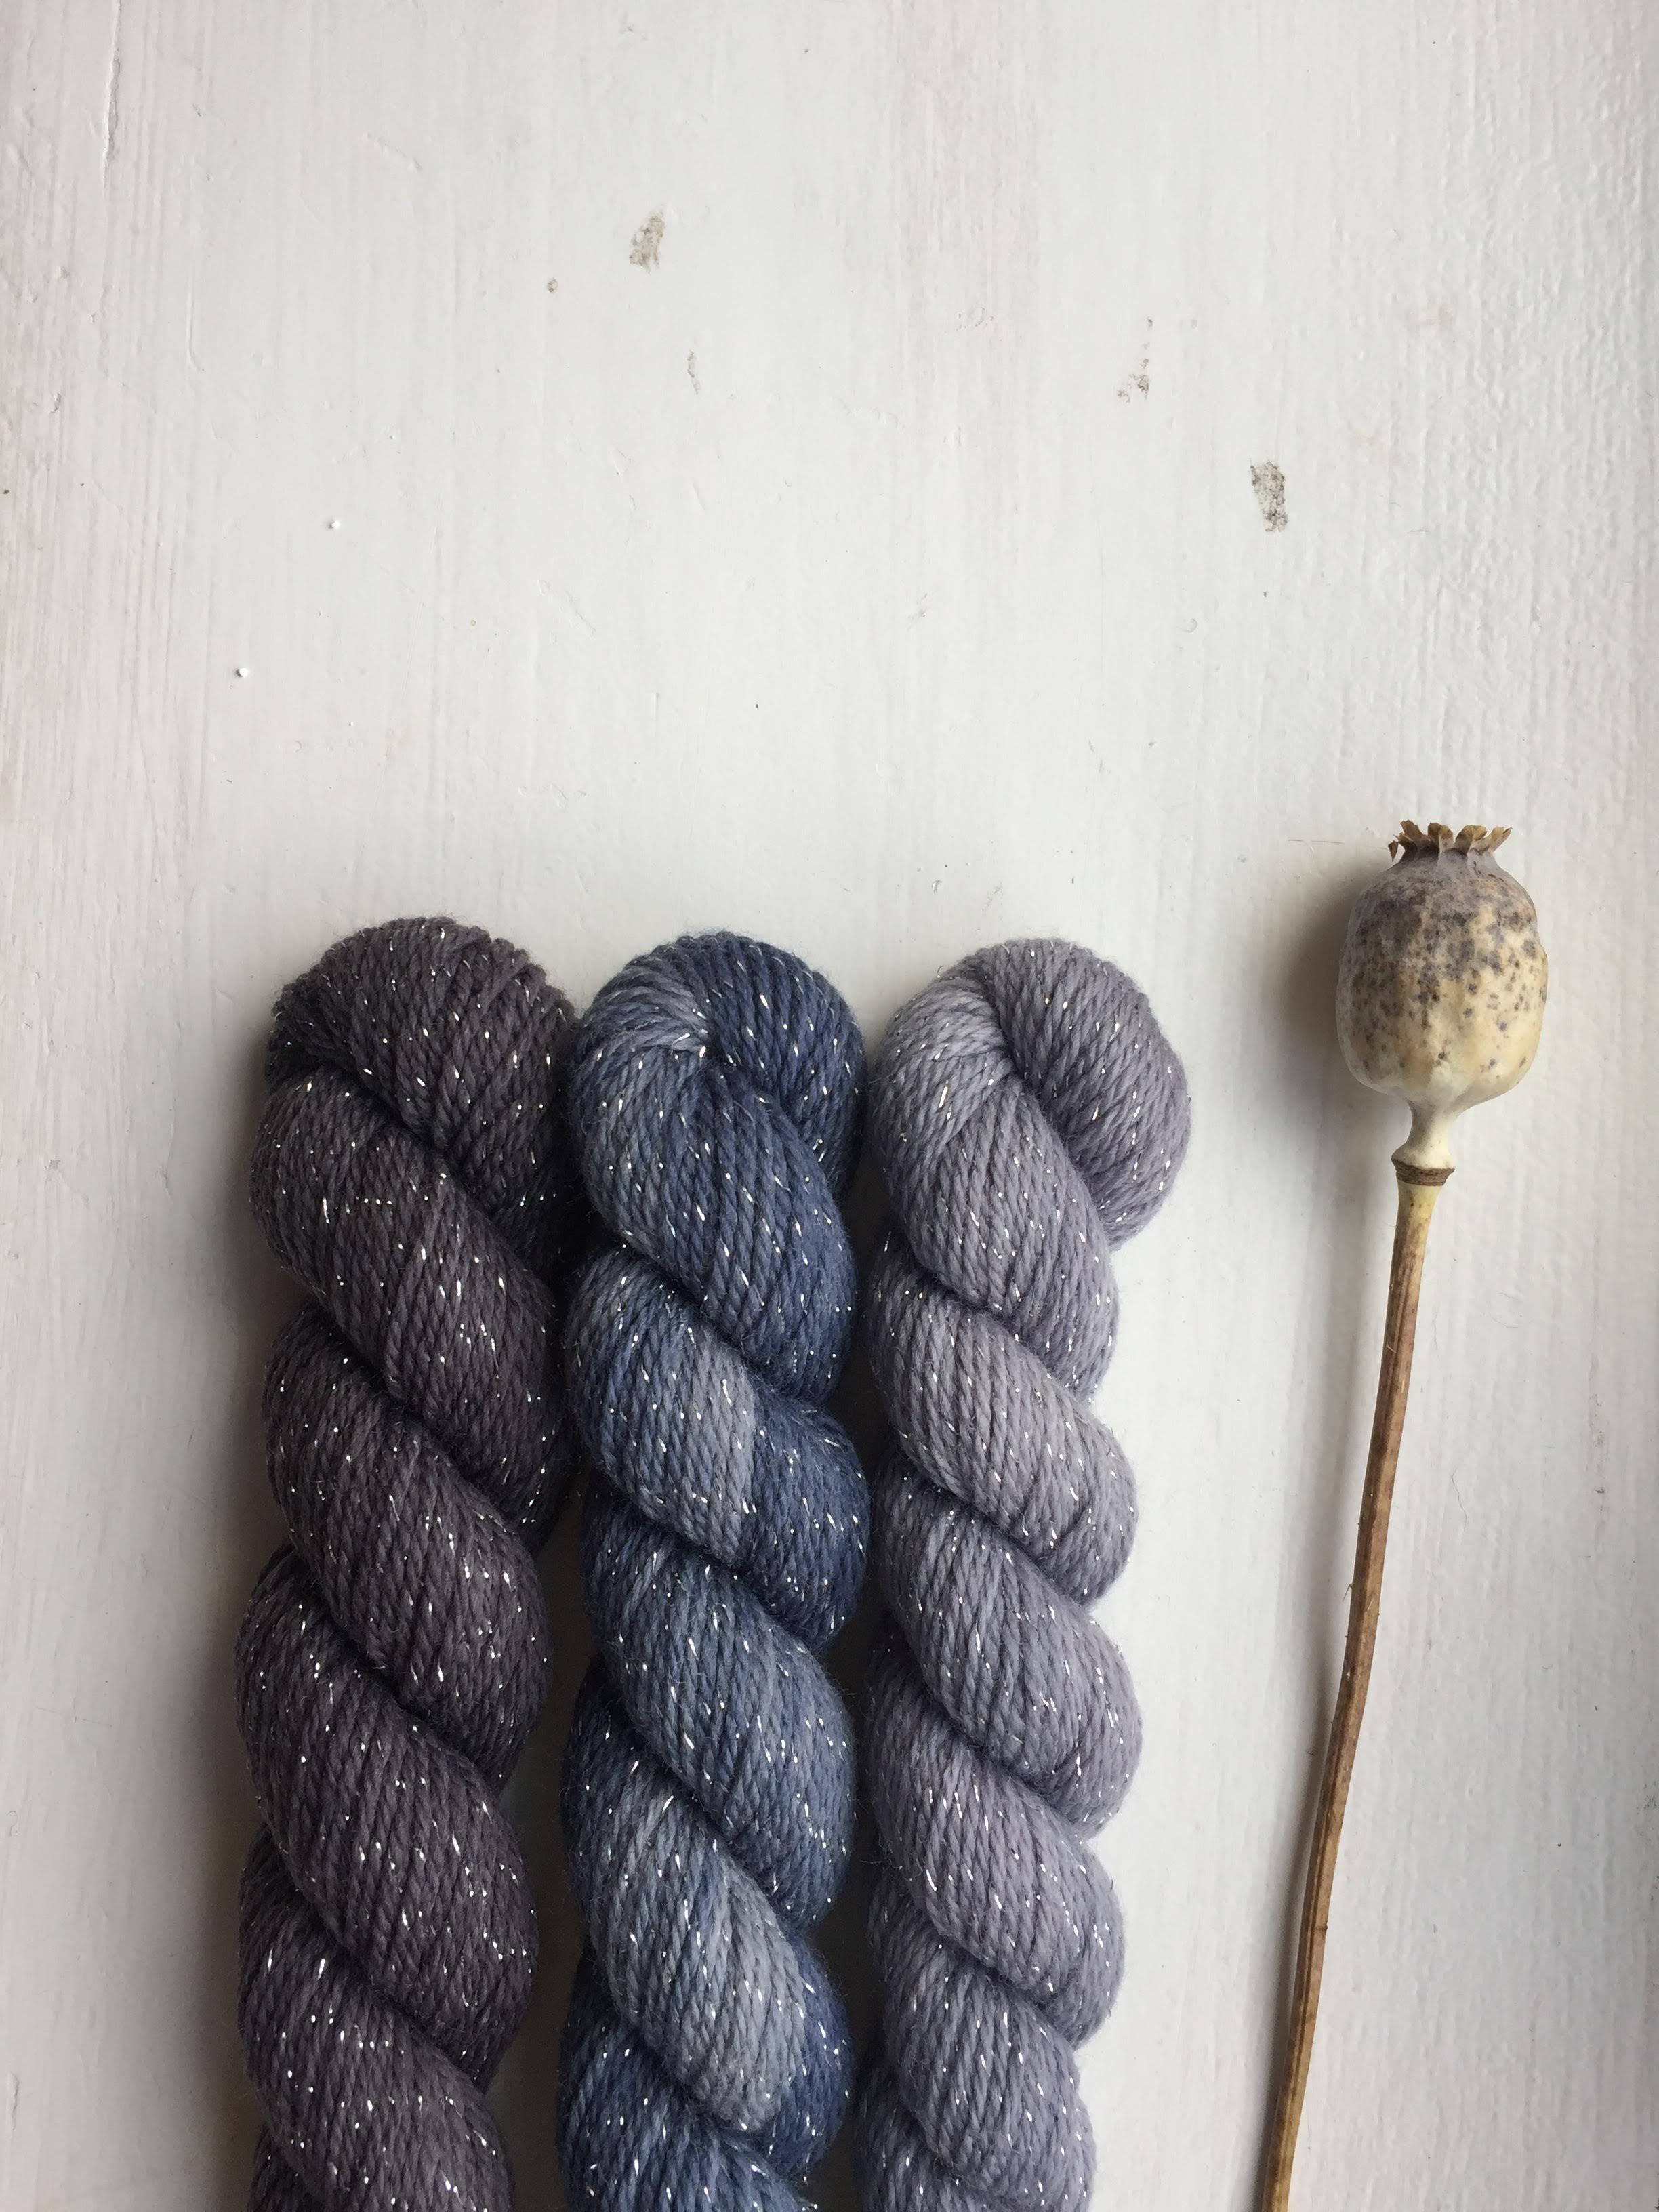 set mini skeins lurex mulesing free merino naturally hand dyed ireland irish indie dyer plant botanical burren teinture végétale naturelle logwood (2) bois de campeche